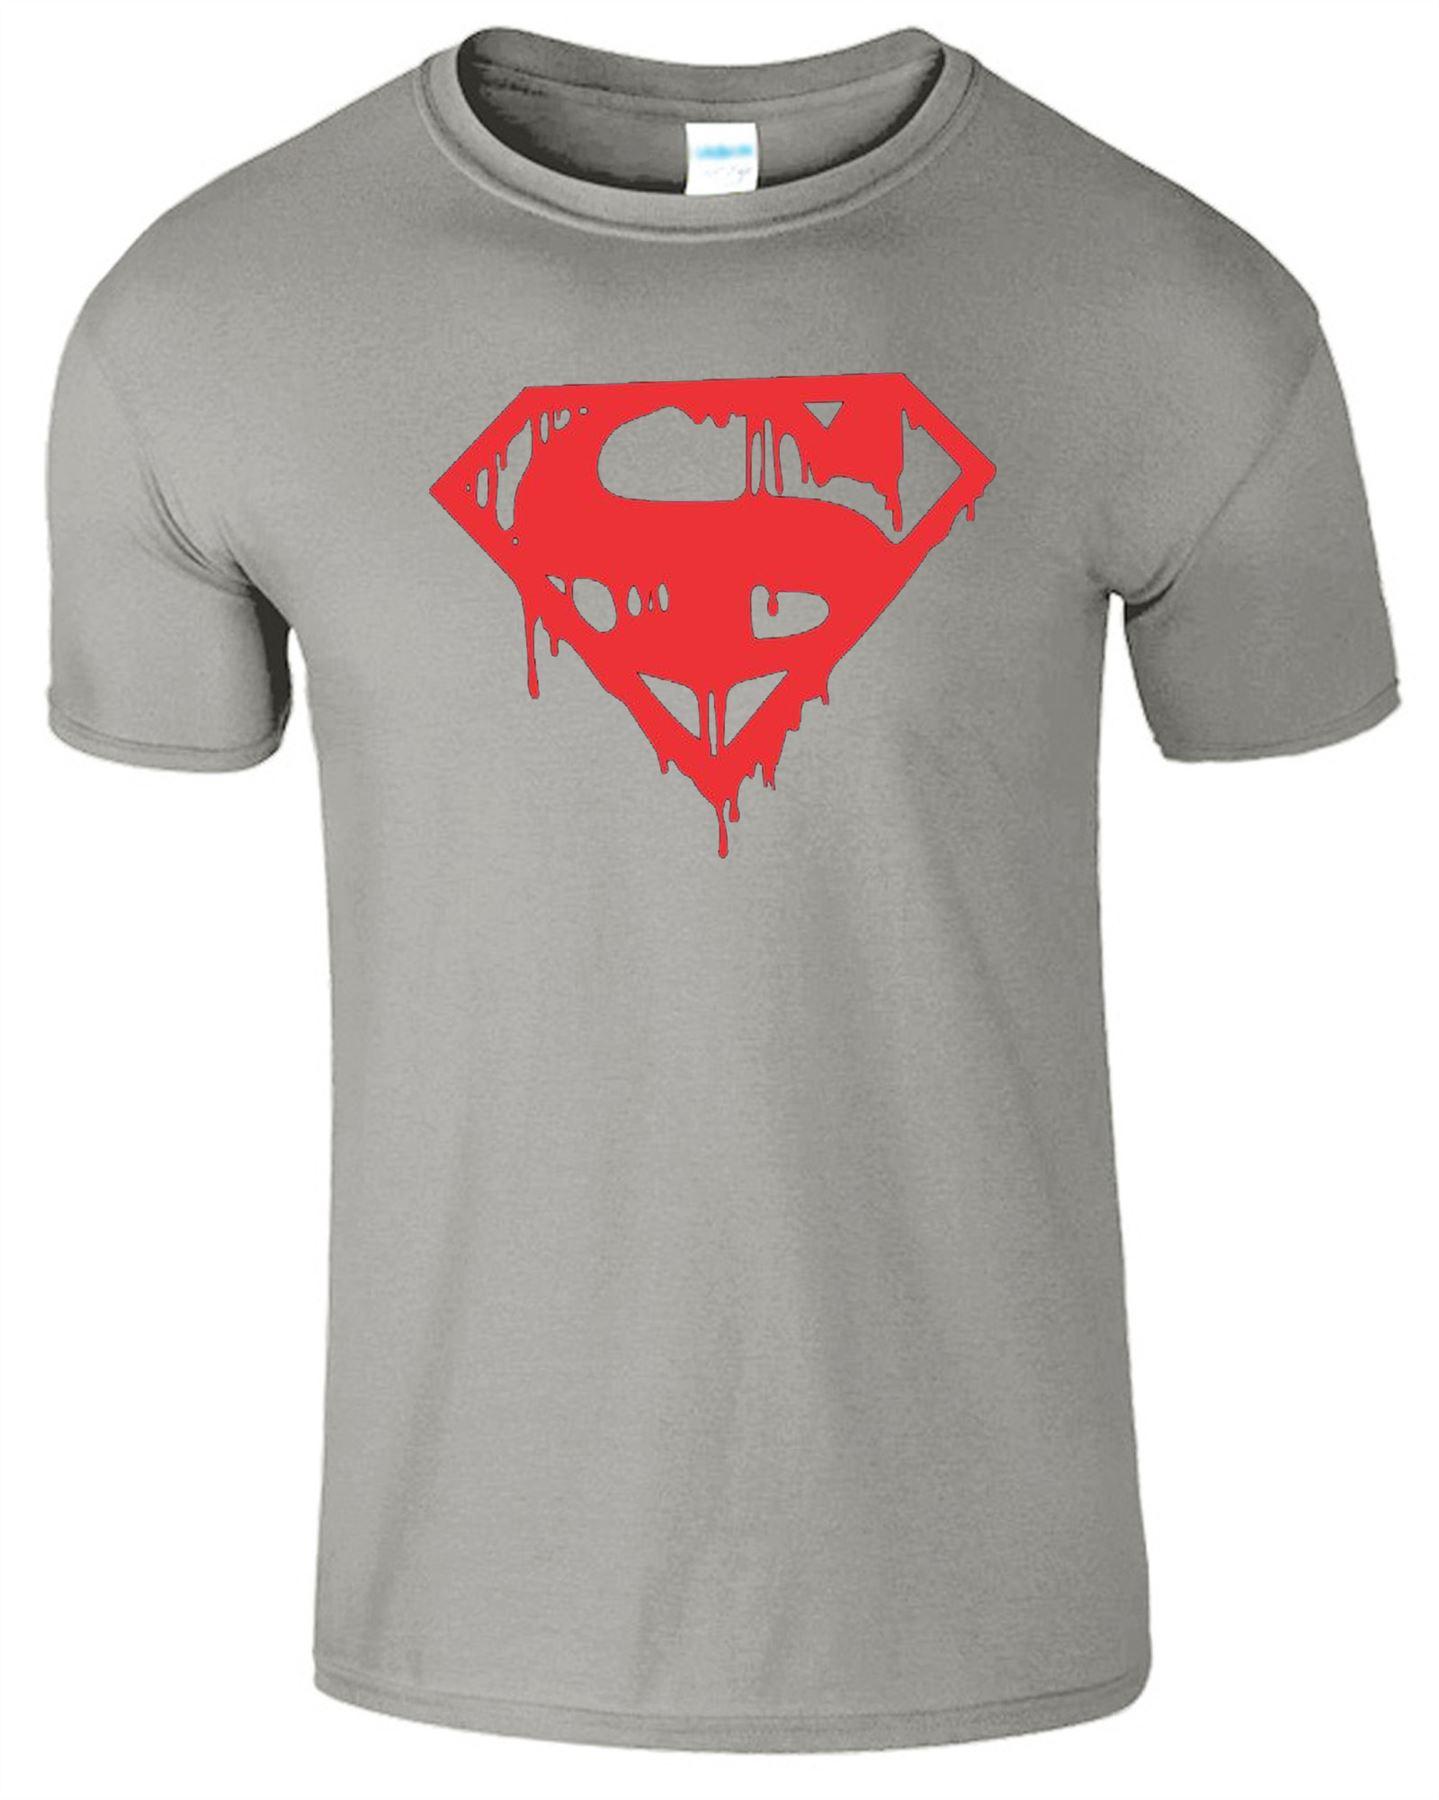 Super Evil Drip Mens T-Shirt Gym Bodybuilding Motivation Fitness Top T Shirt